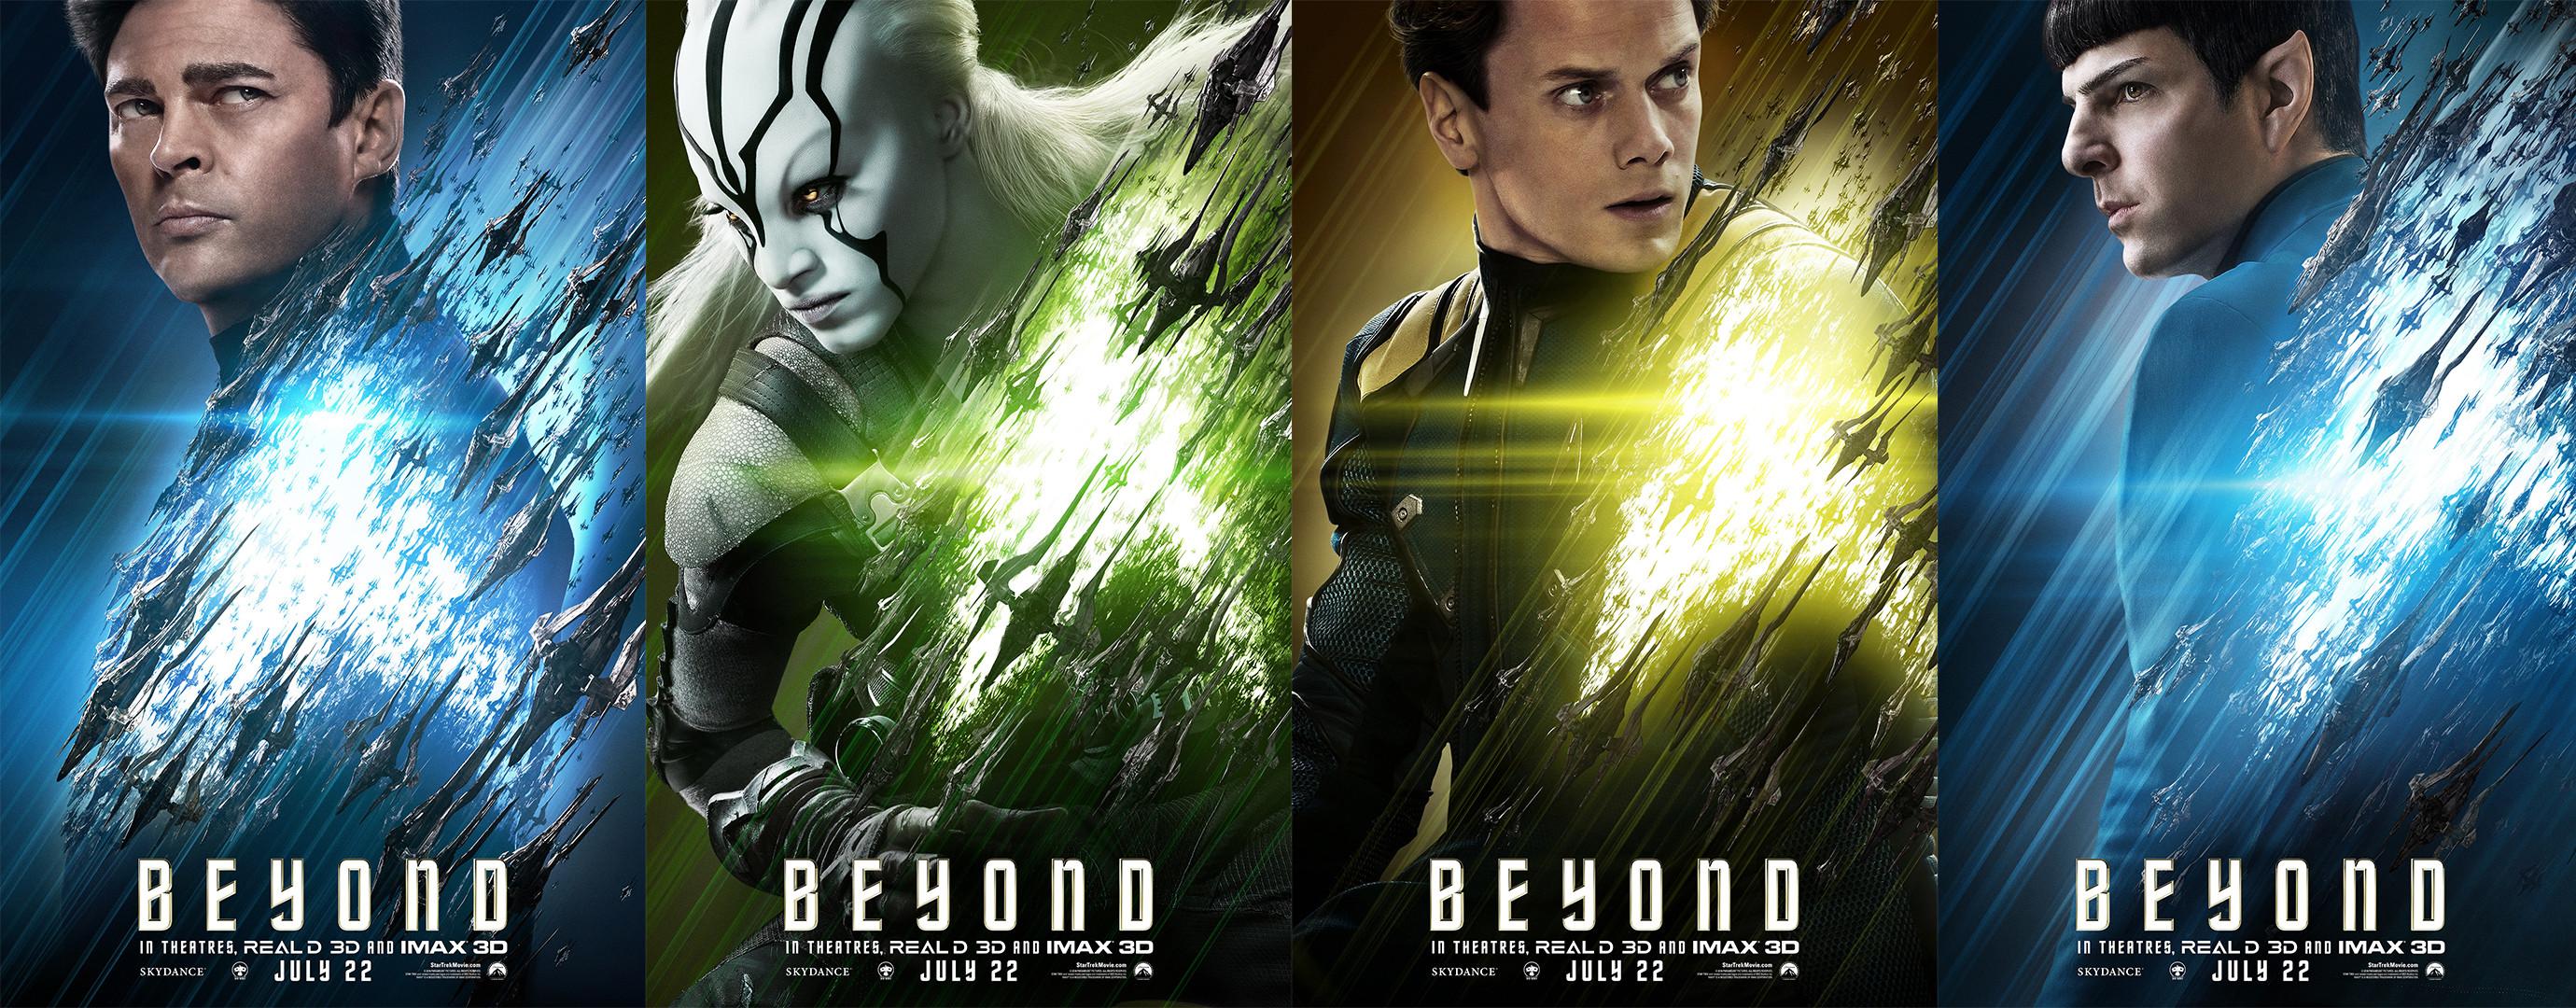 Wallpapers Star Trek: Más allá, fondos Star Trek Beyond gratis